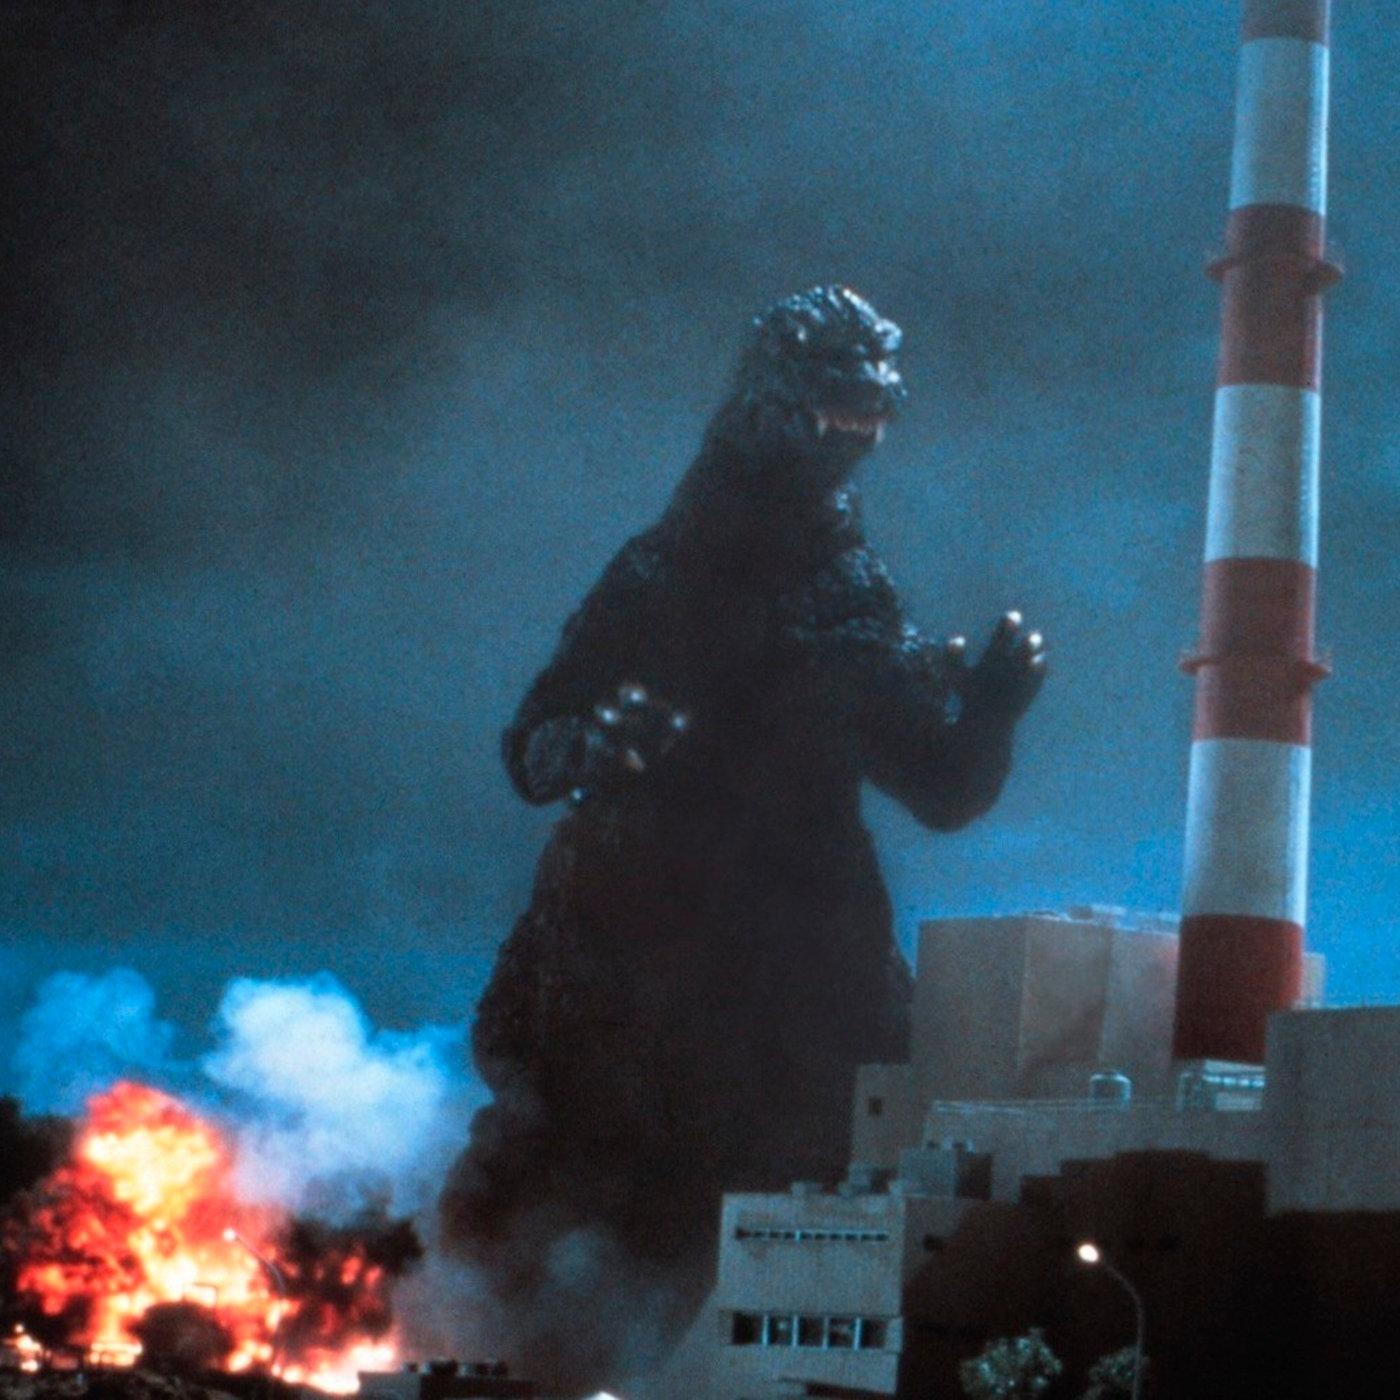 Die Bestie von Fukushima - Radioaktives Monster bedroht Japan